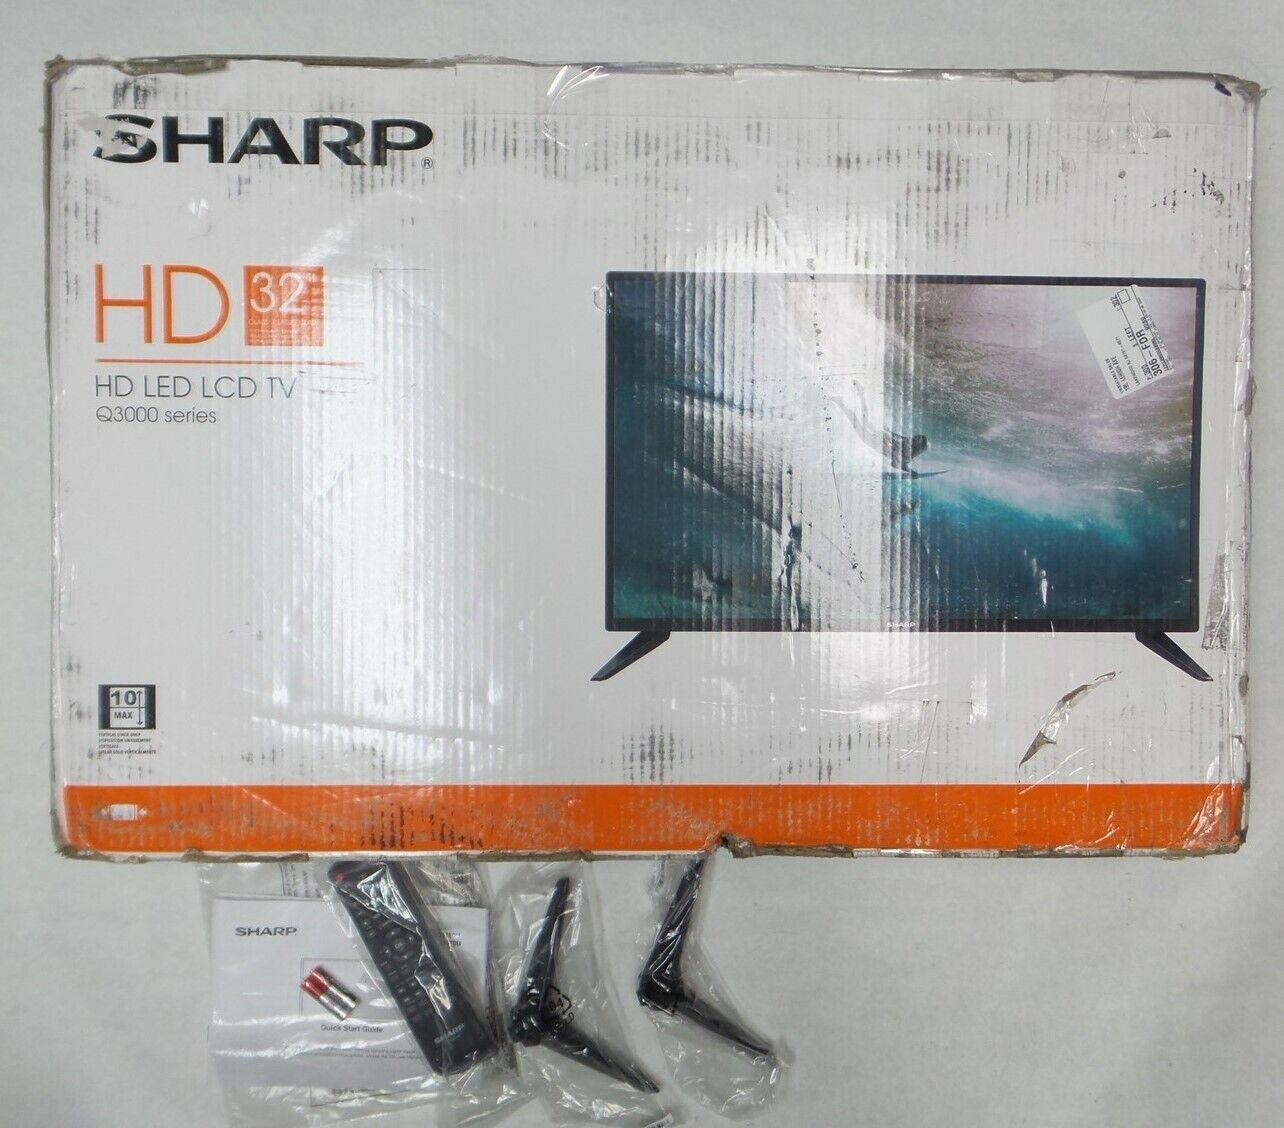 Sharp LC-32Q3170U 32 inch 720P LED HD TV with 2 HDMI inputs, 1 USB Port - BROKEN